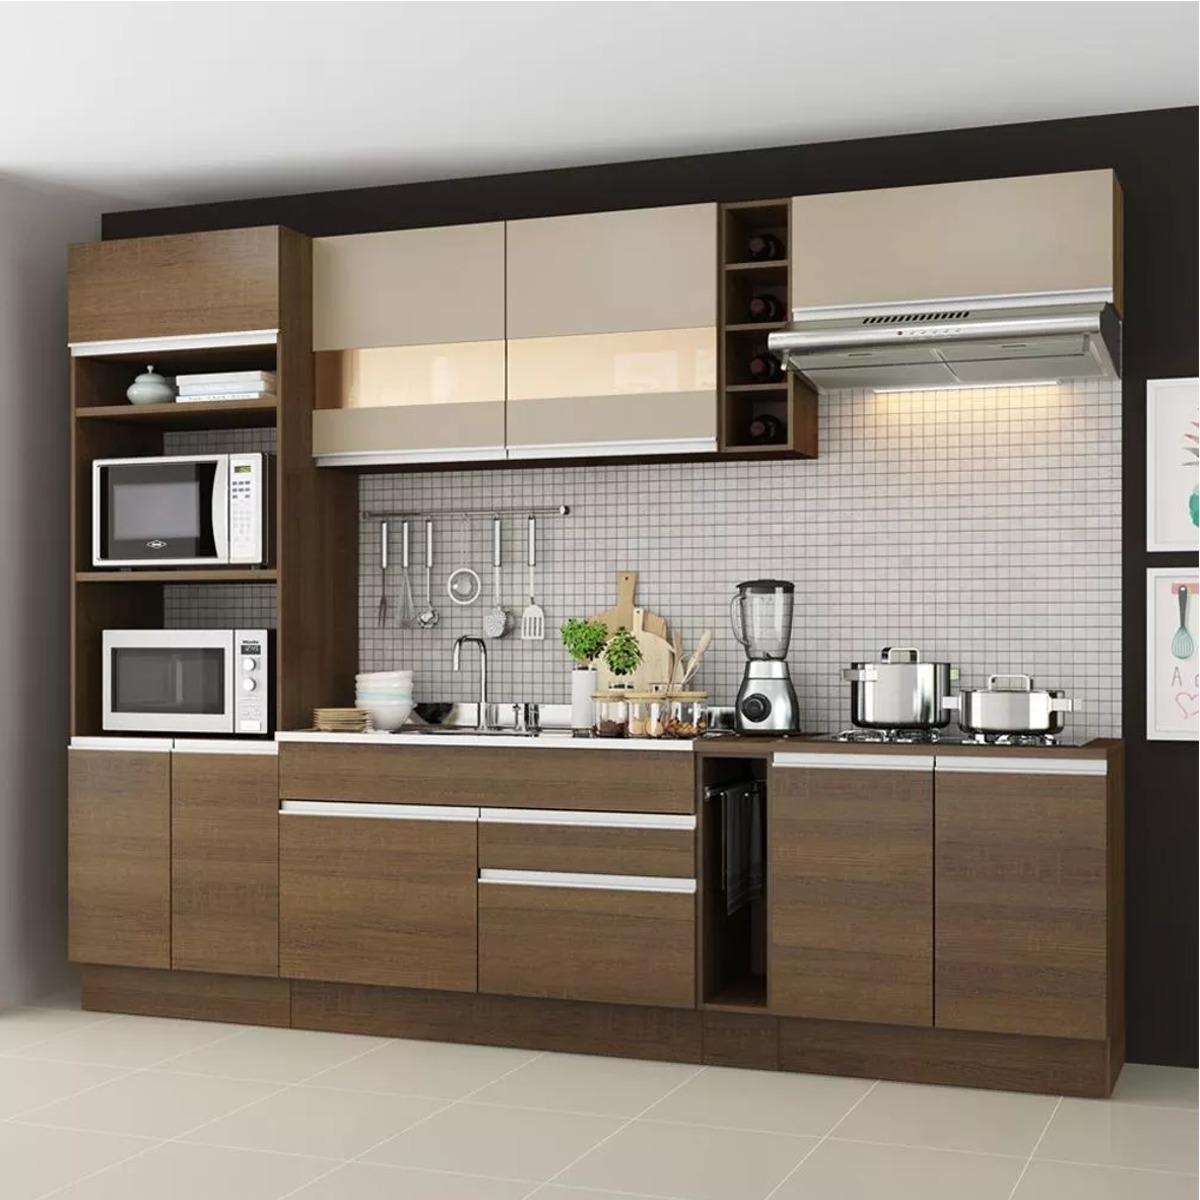 Cocina Integral Muebles Moderna